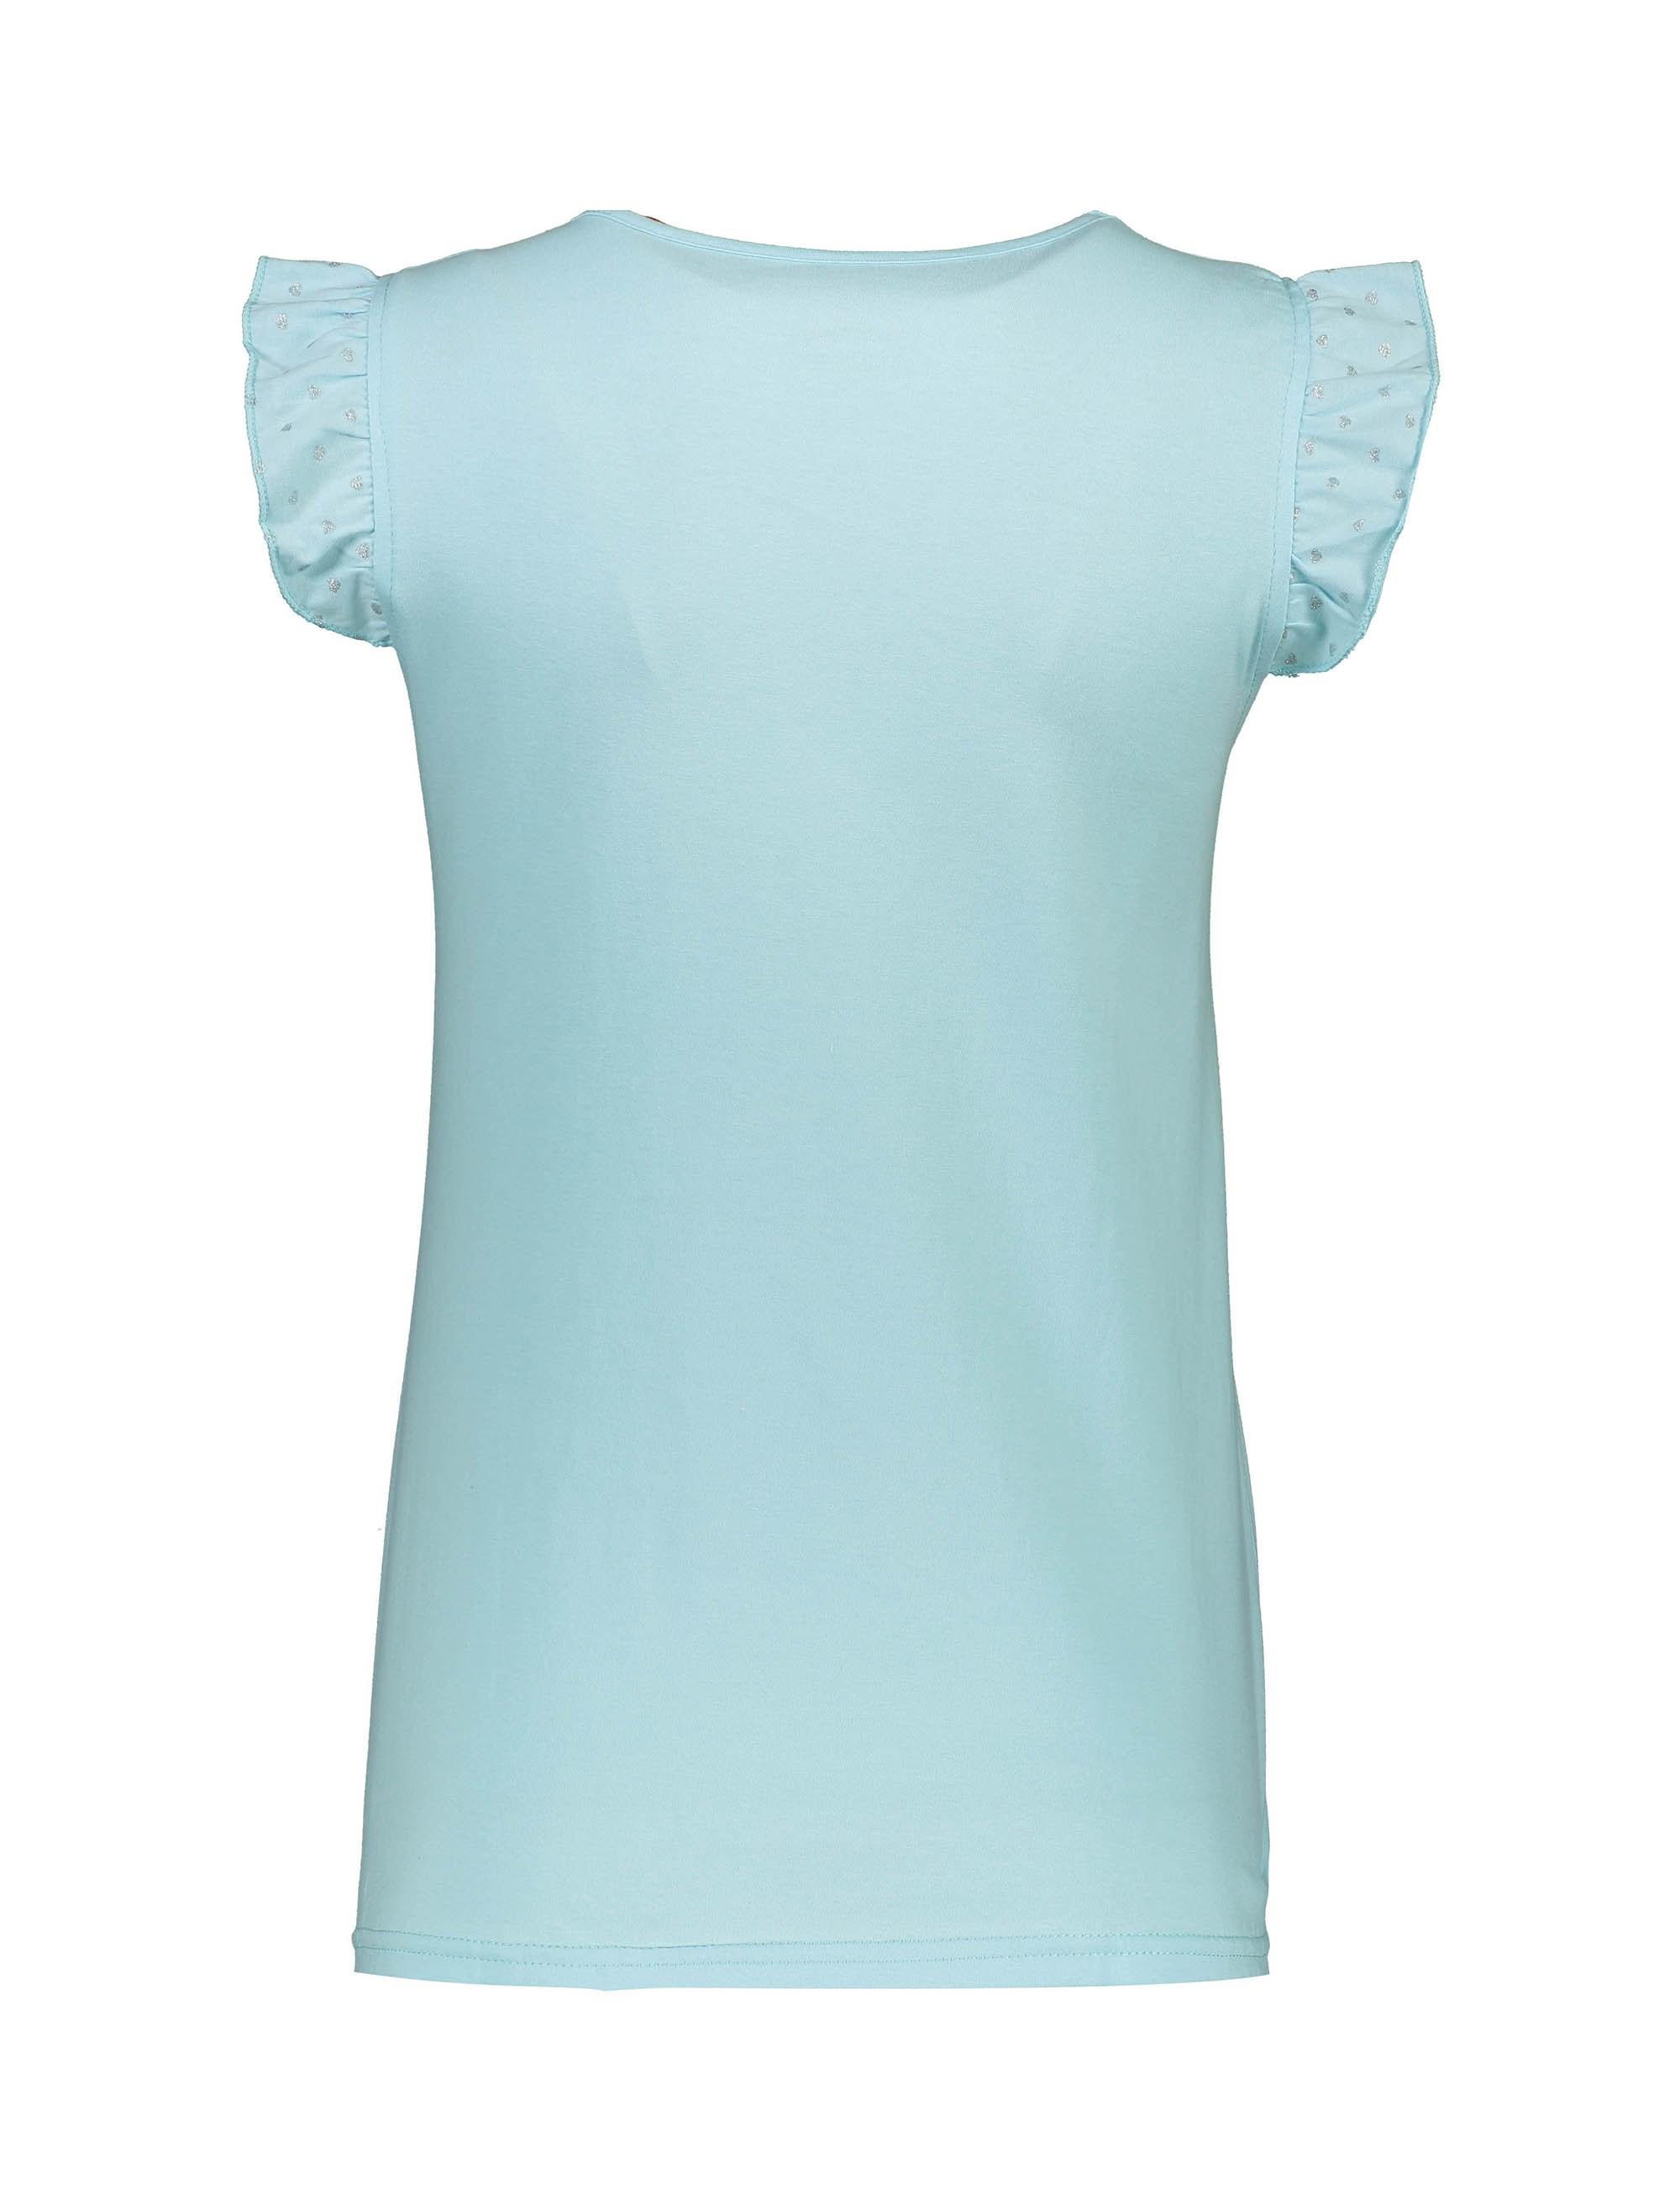 تی شرت و شلوارک نخی زنانه - ناربن - آبي روشن - 3